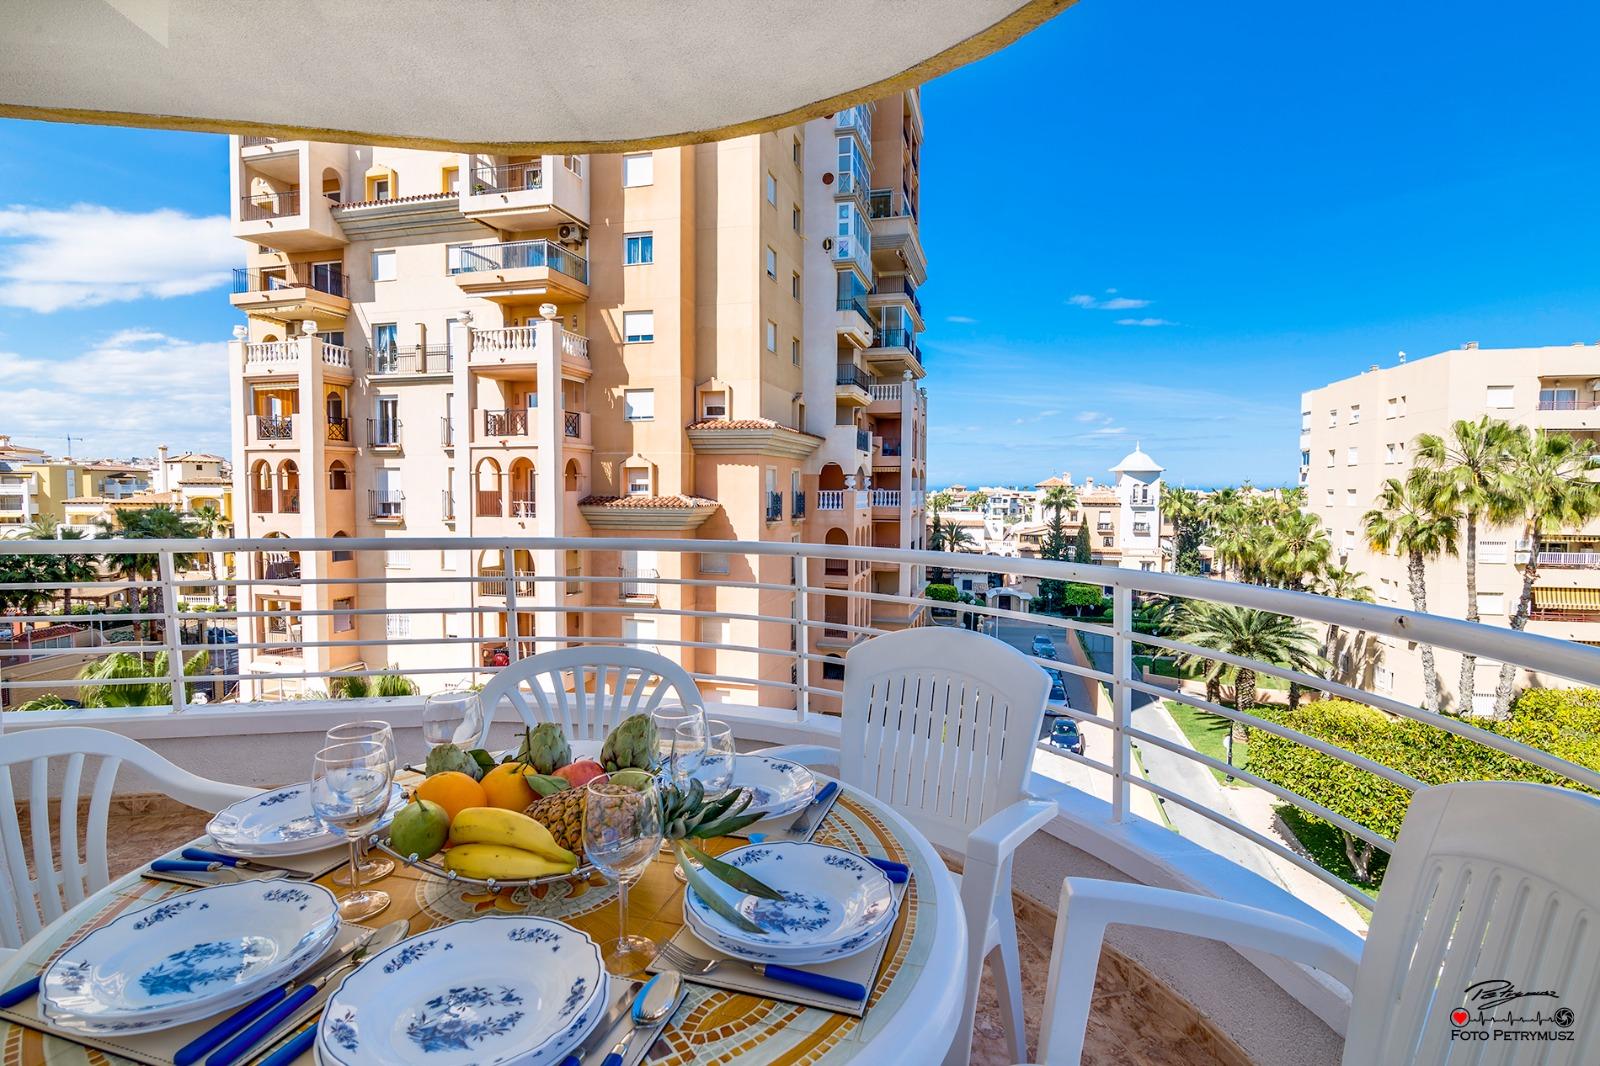 Apartment Paralela